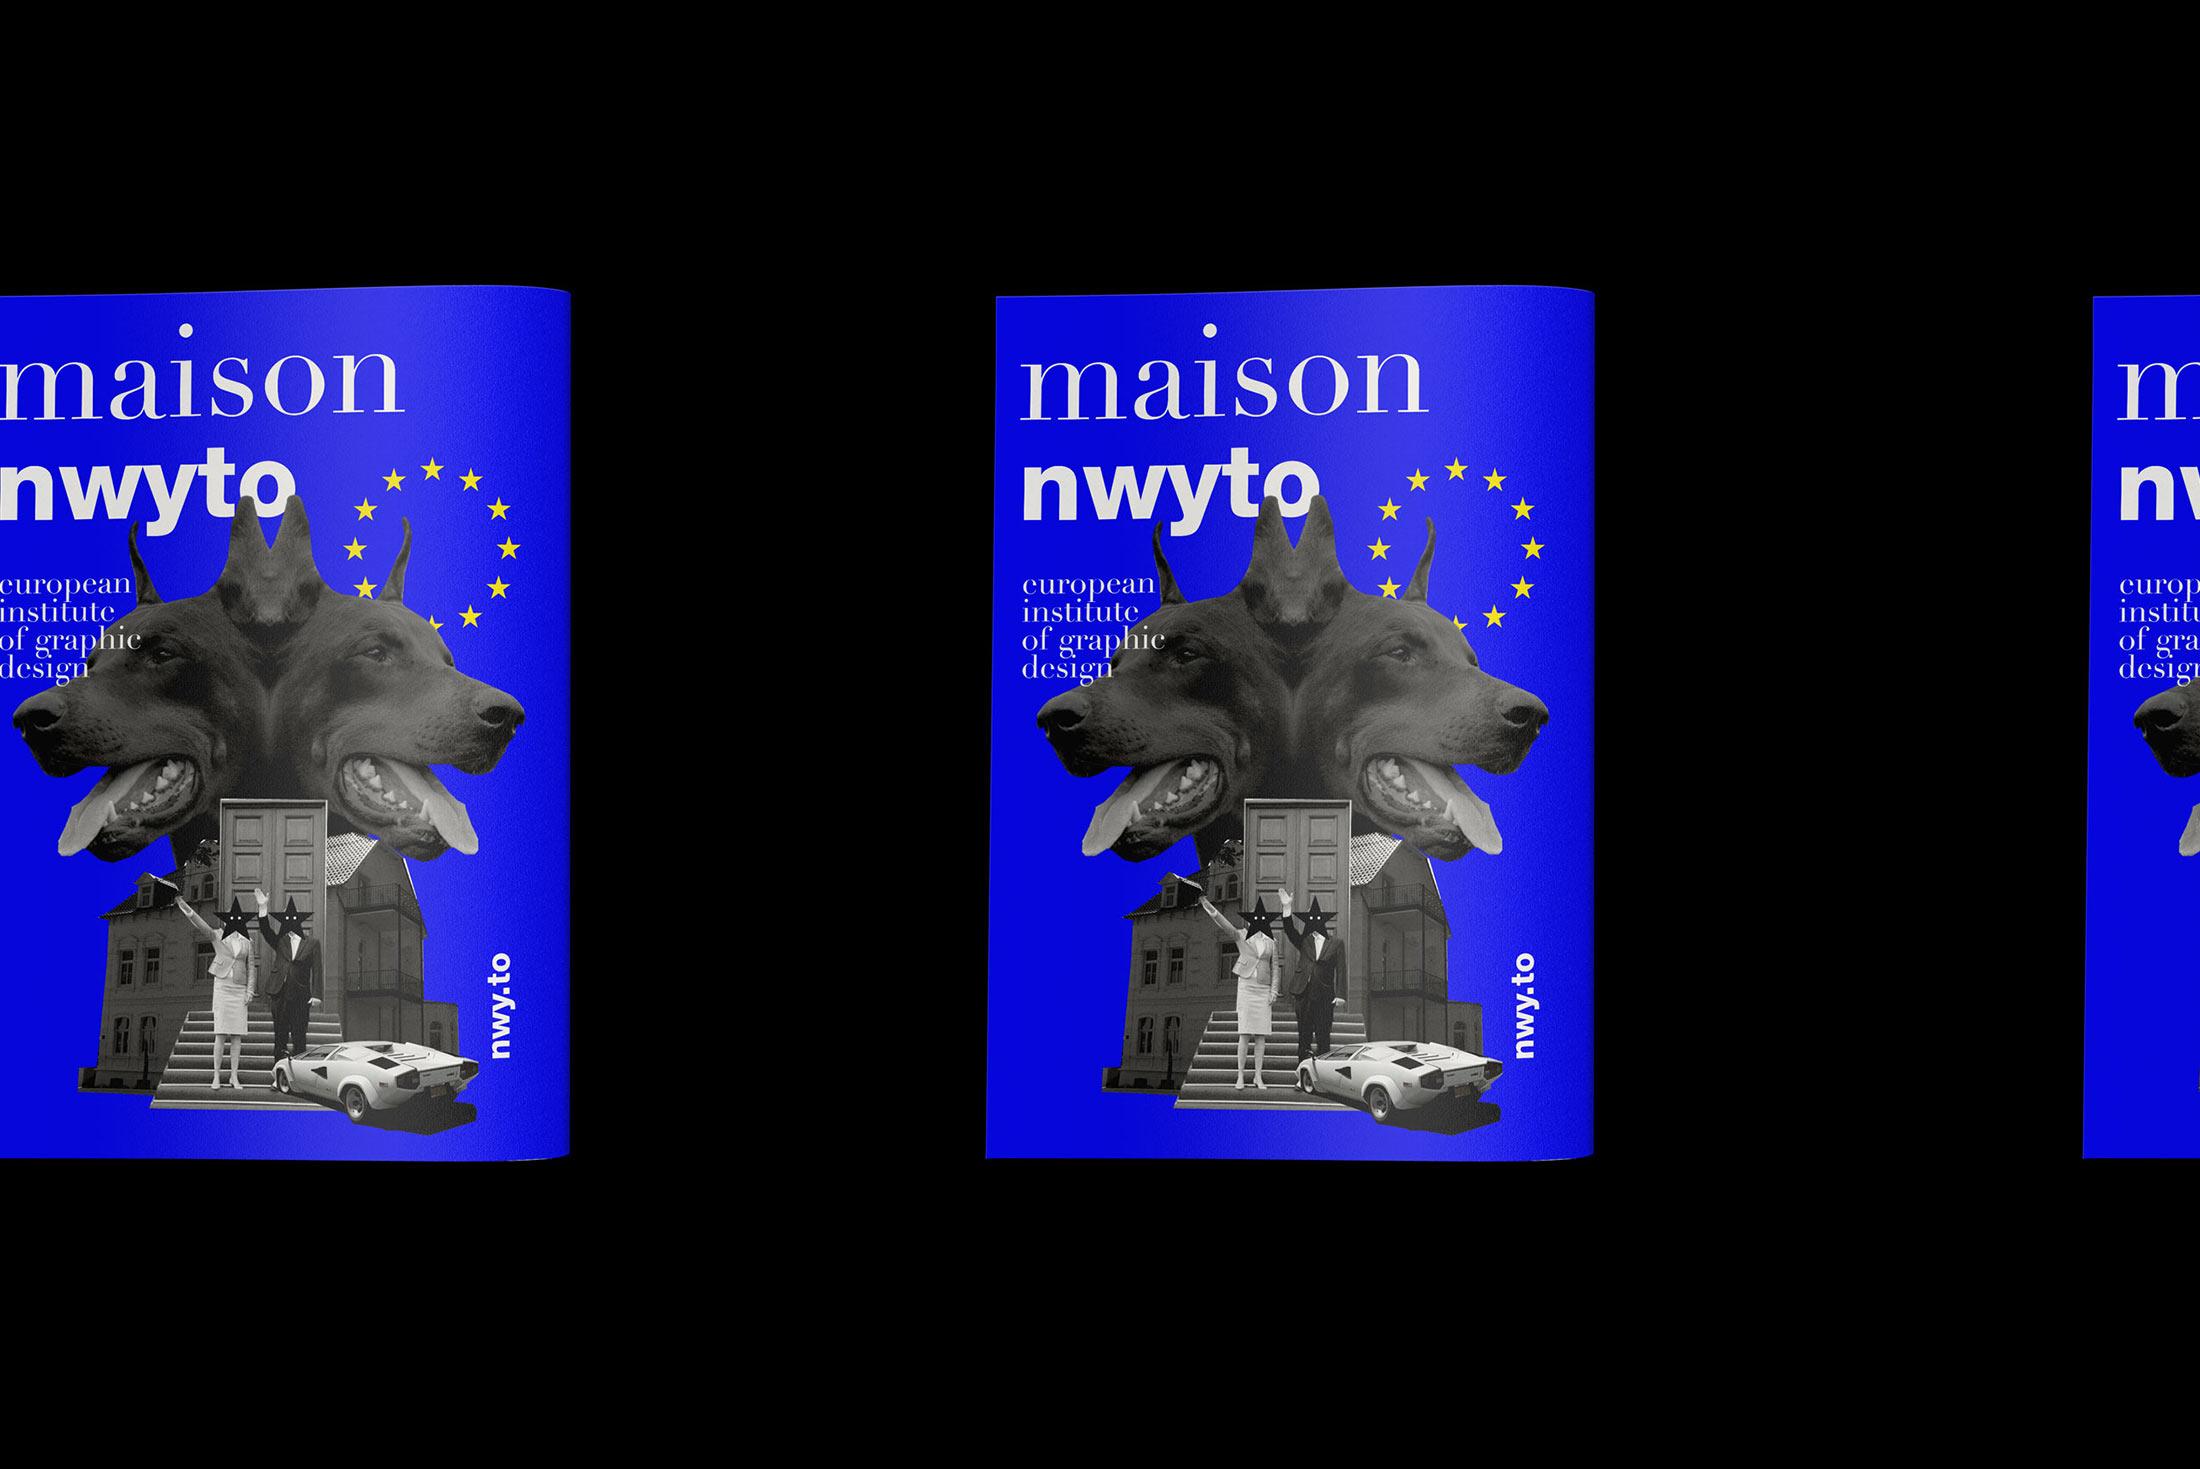 NikolasWrobel-Maison_nwyto